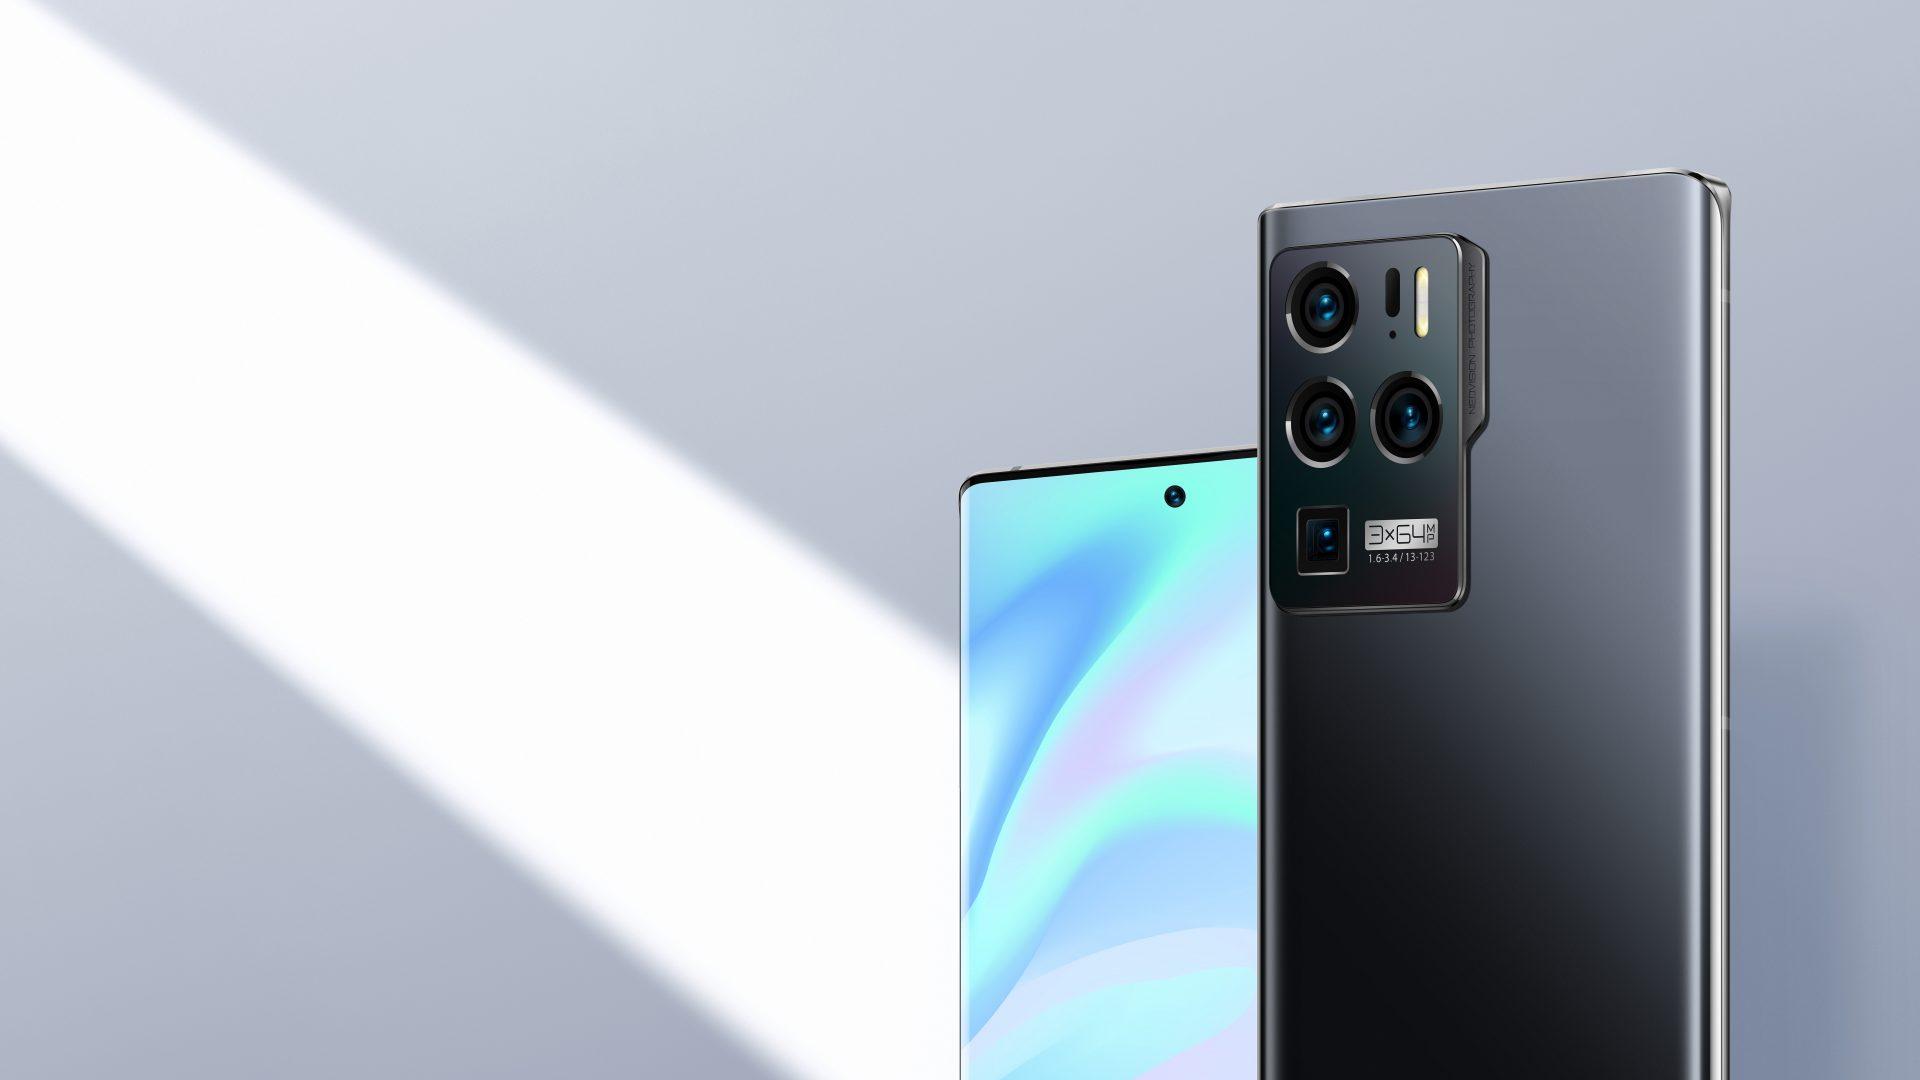 ZTE Axon 30 Ultra: primul telefon high-end cu trei camere de 64 megapixeli și preț sub 1000 de euro